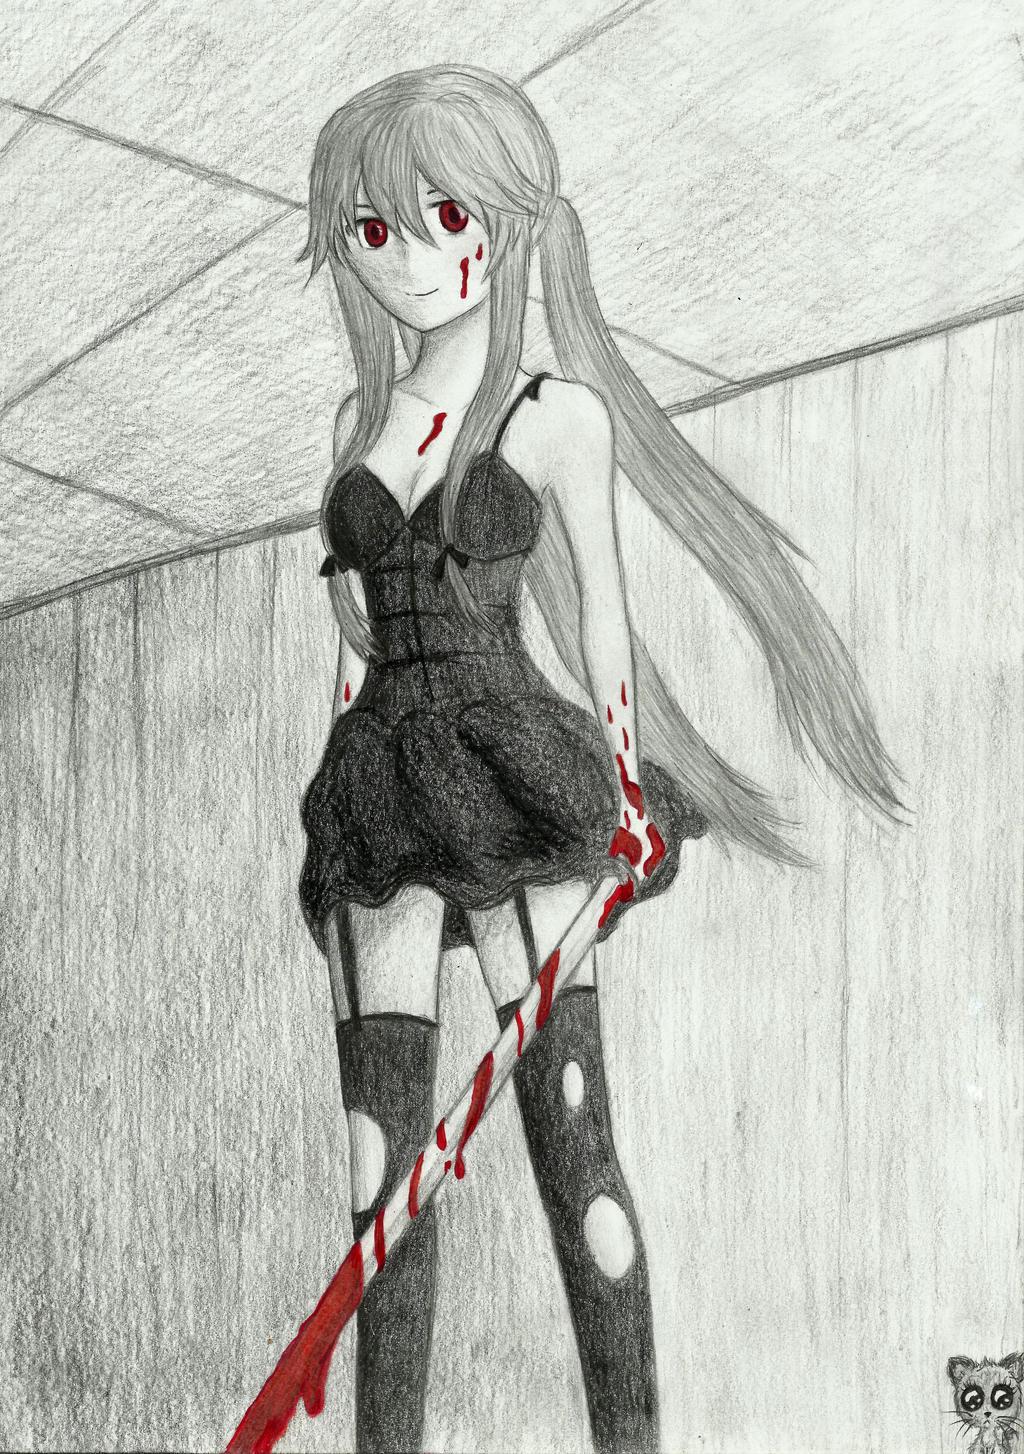 Yuno by Popijawka